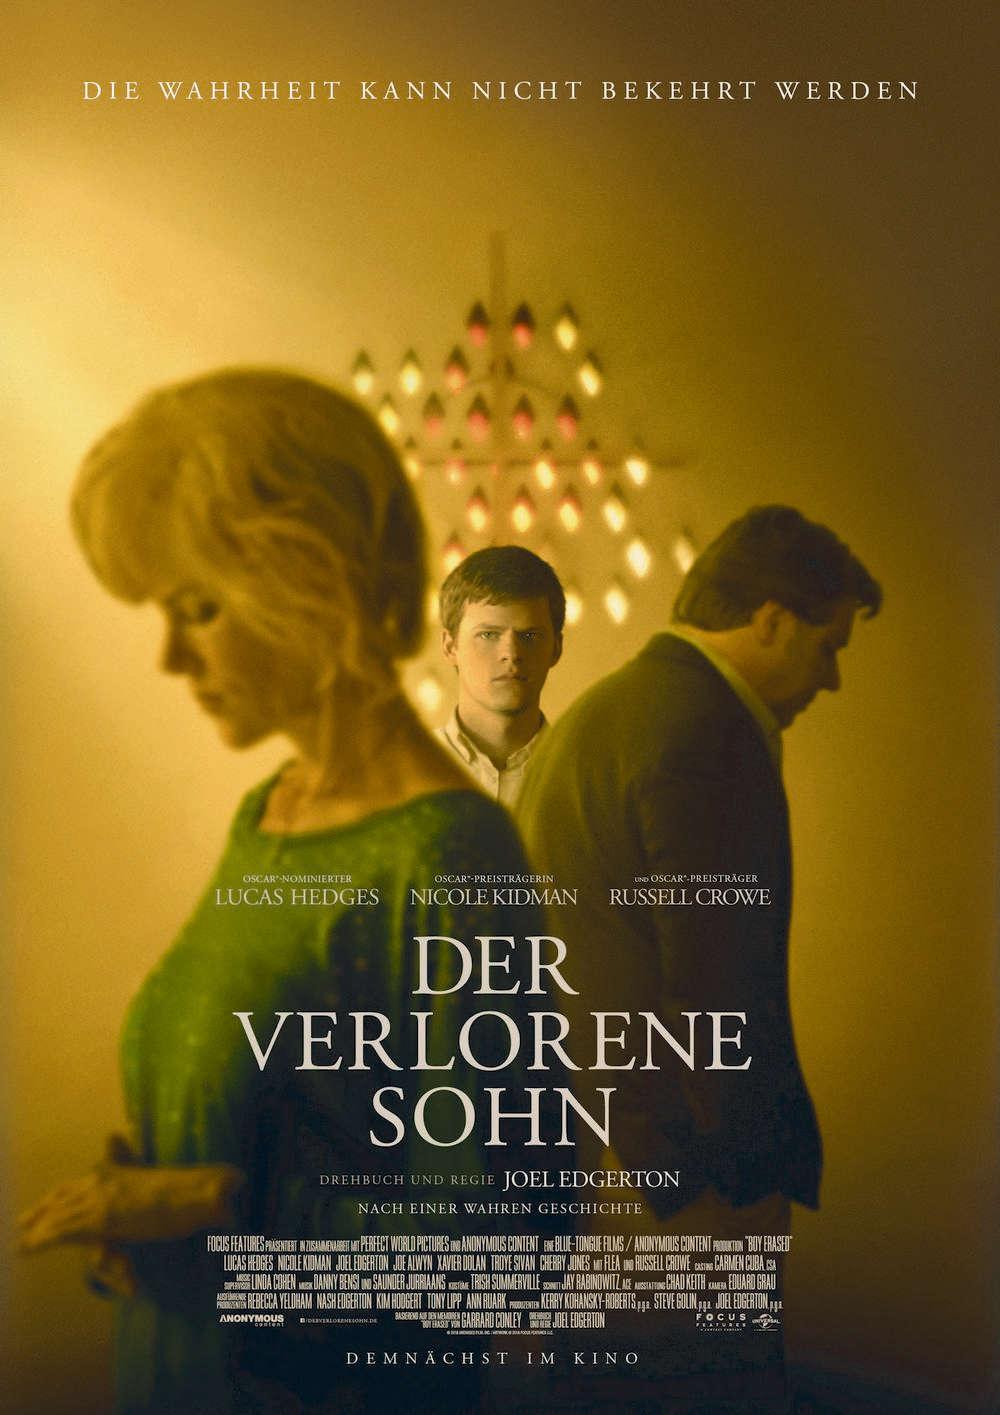 Der Verlorene Sohn Film 2019